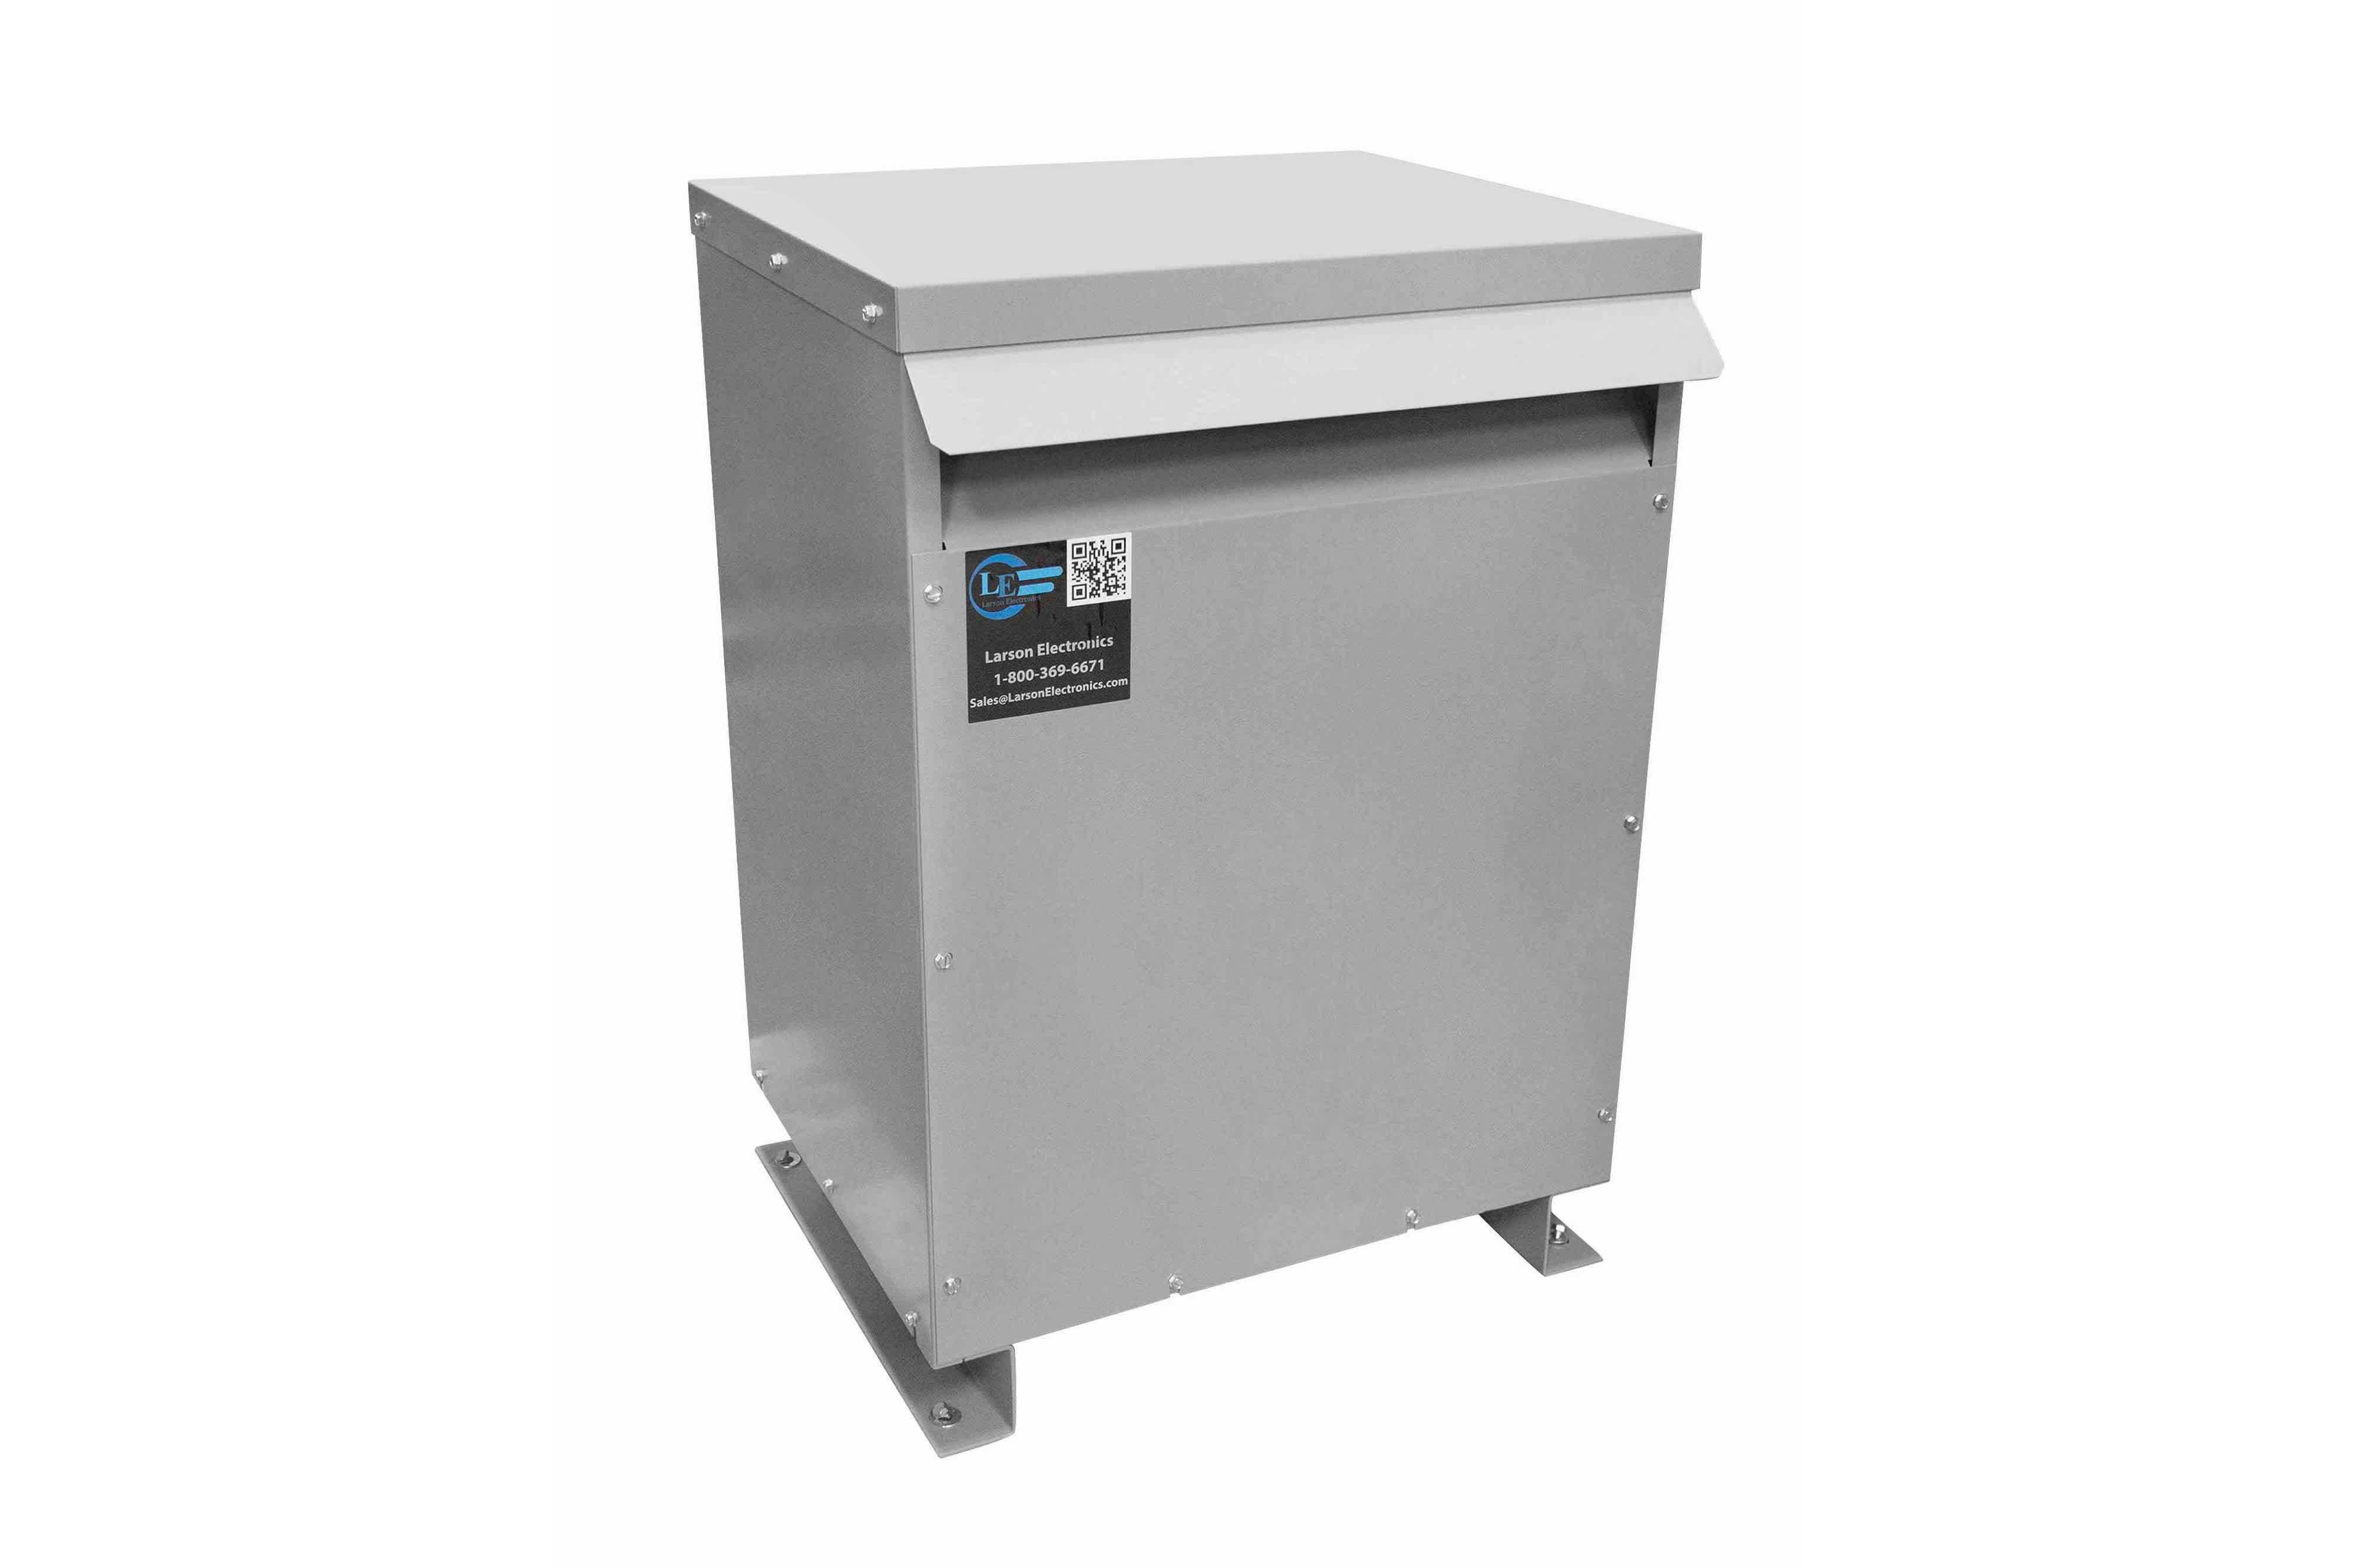 300 kVA 3PH Isolation Transformer, 400V Wye Primary, 208V Delta Secondary, N3R, Ventilated, 60 Hz